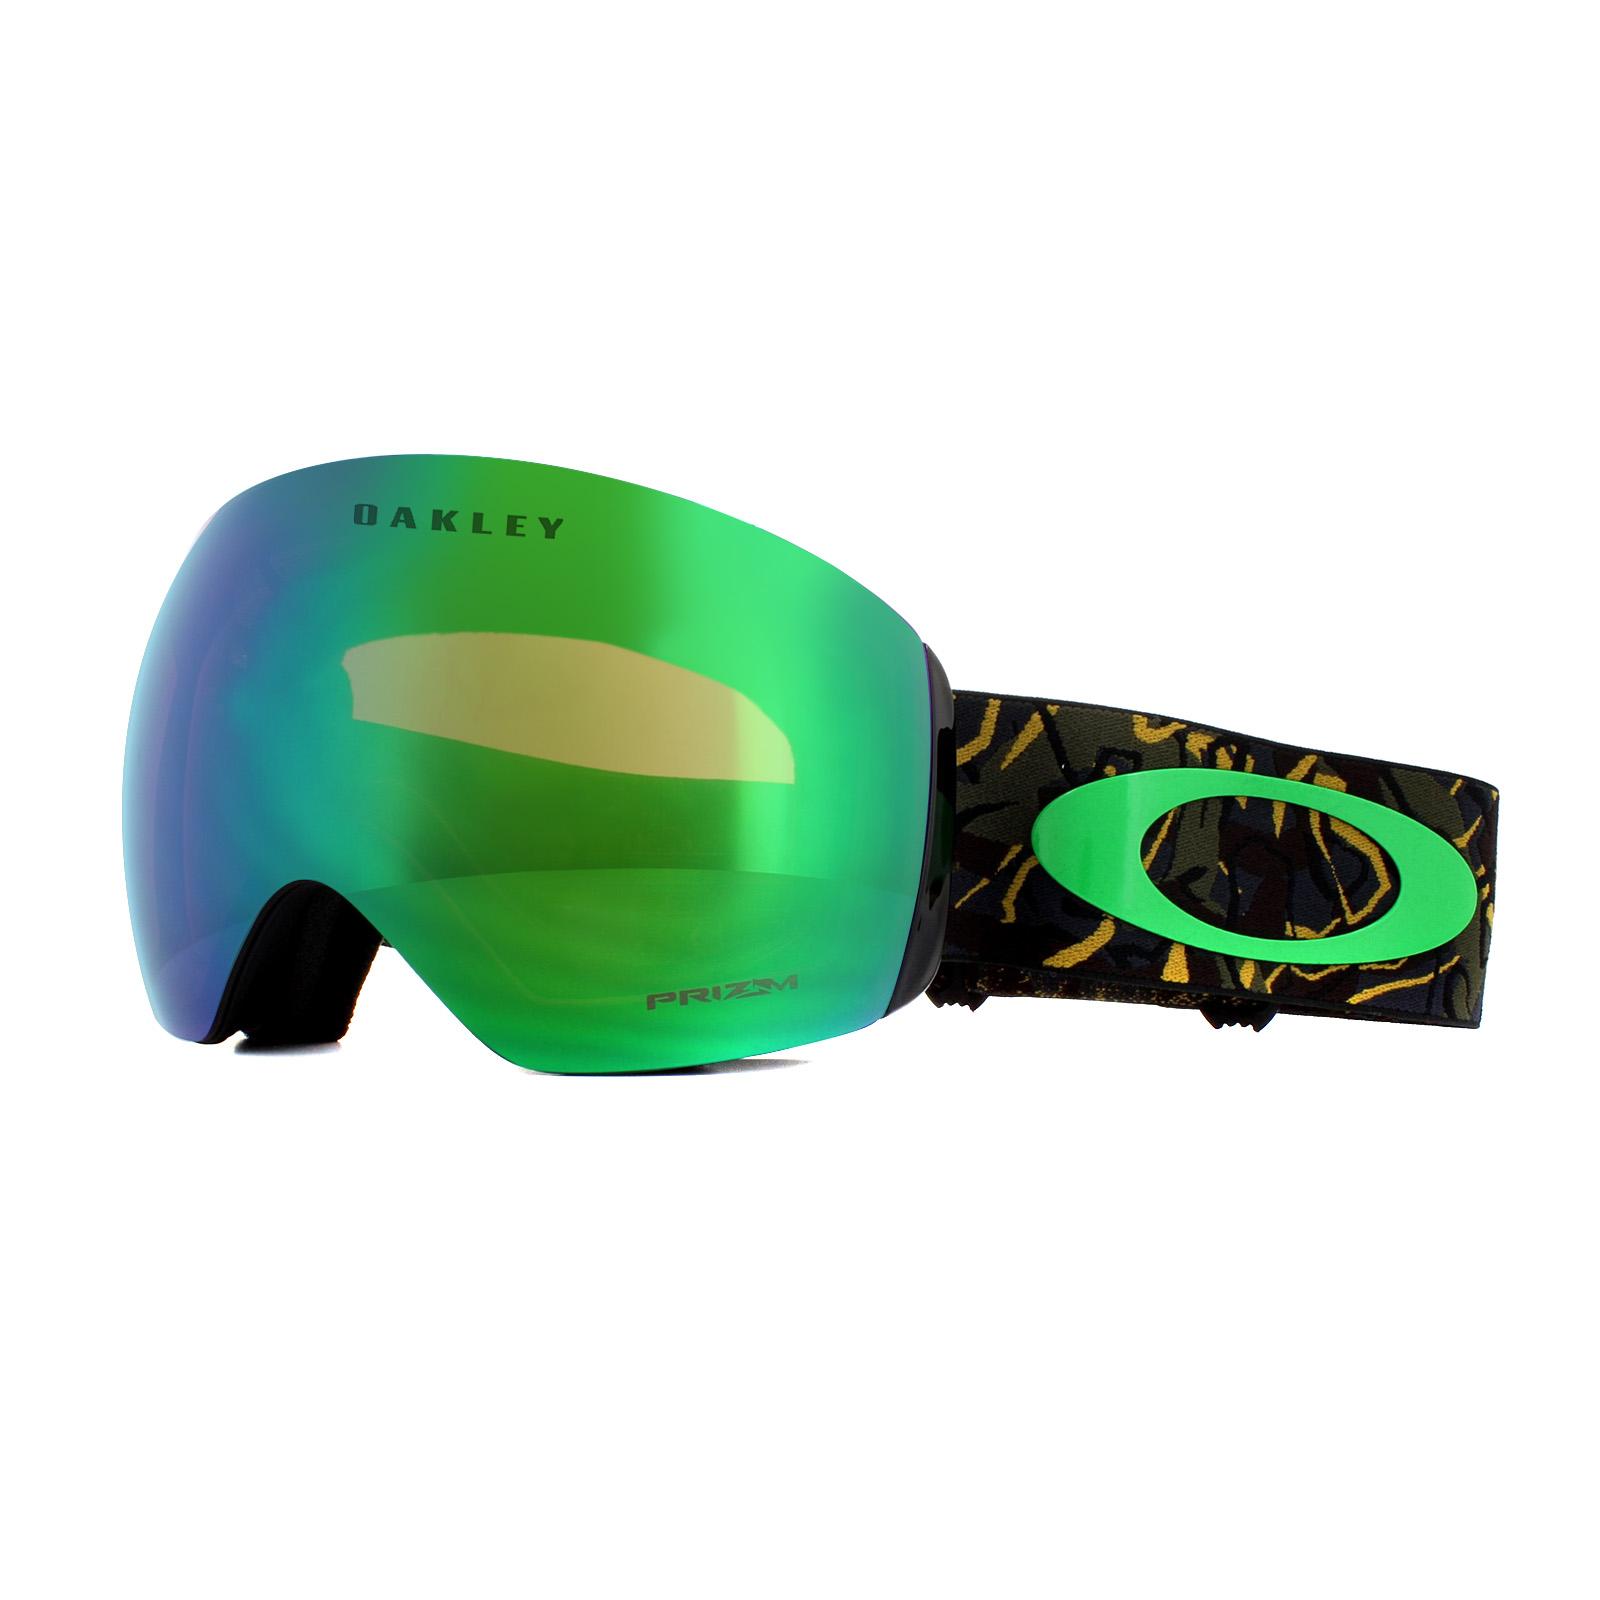 2073d6aba9ae Sentinel Oakley Ski Goggles Flight Deck OO7050-64 Camo Vine Jungle Prizm  Jade Iridium